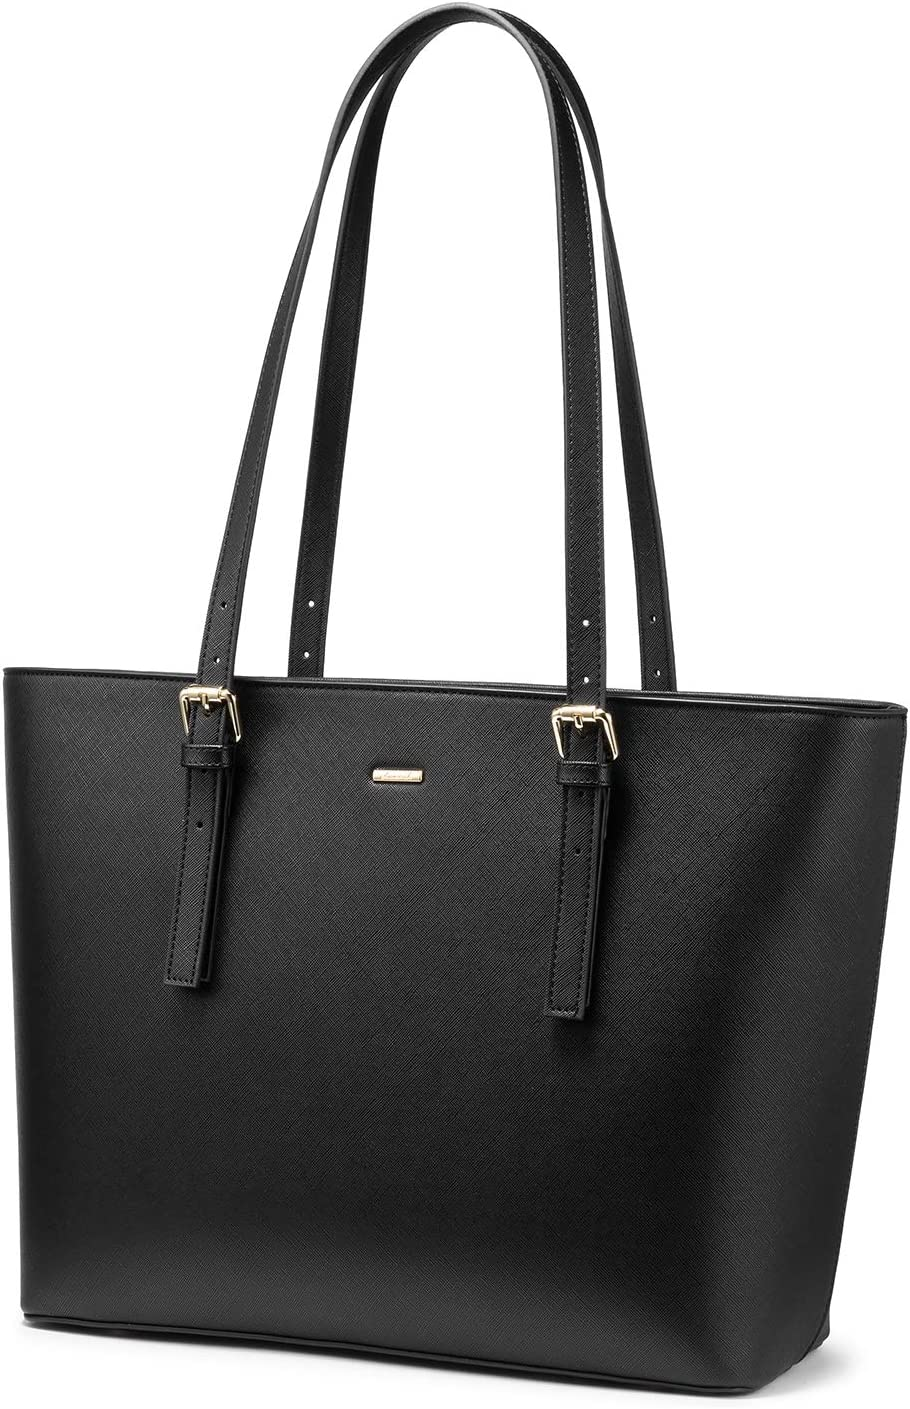 LOVEVOOK Computer Bags for Women Leather Tote Bag Laptop Handbag Work Purse, Black